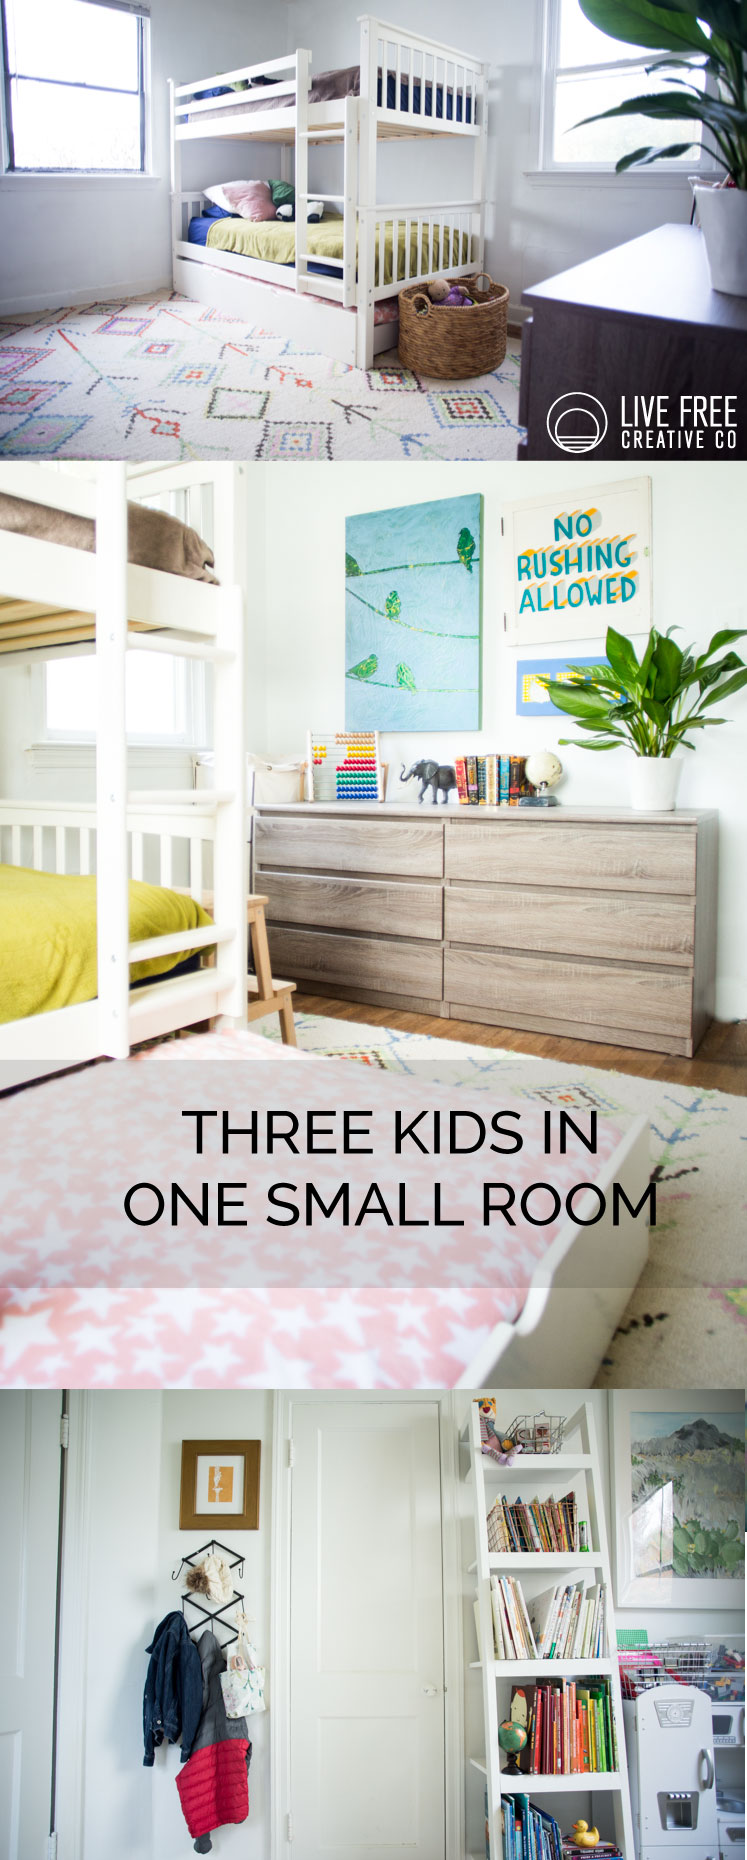 Kids Room Tour | Live Free Creative Co